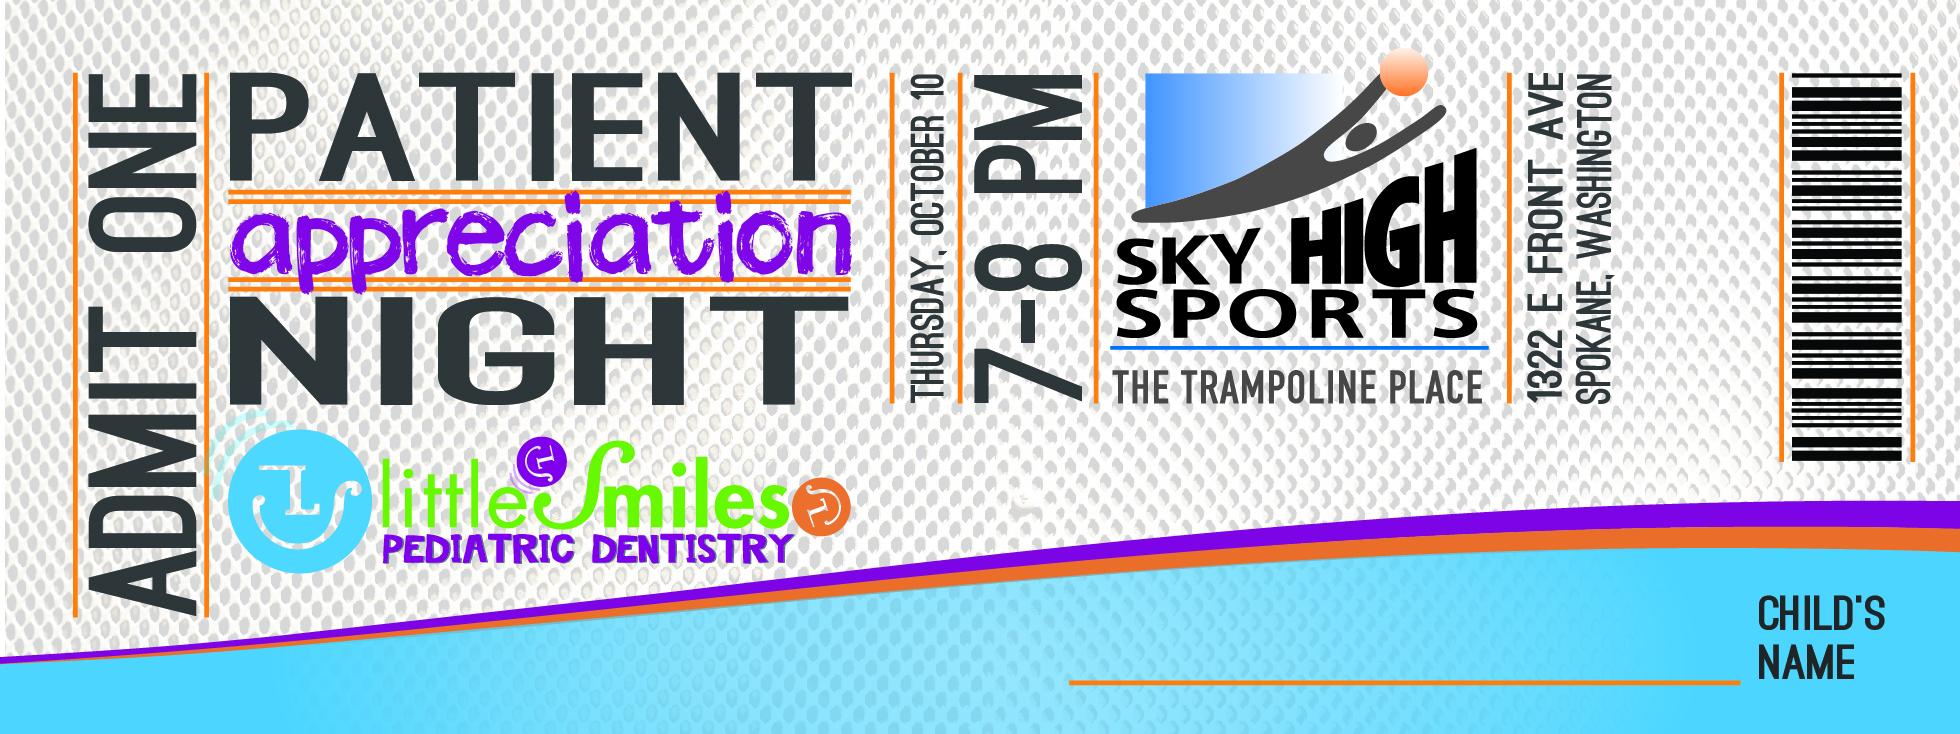 Little Smiles Ticket 7-8 pm-01